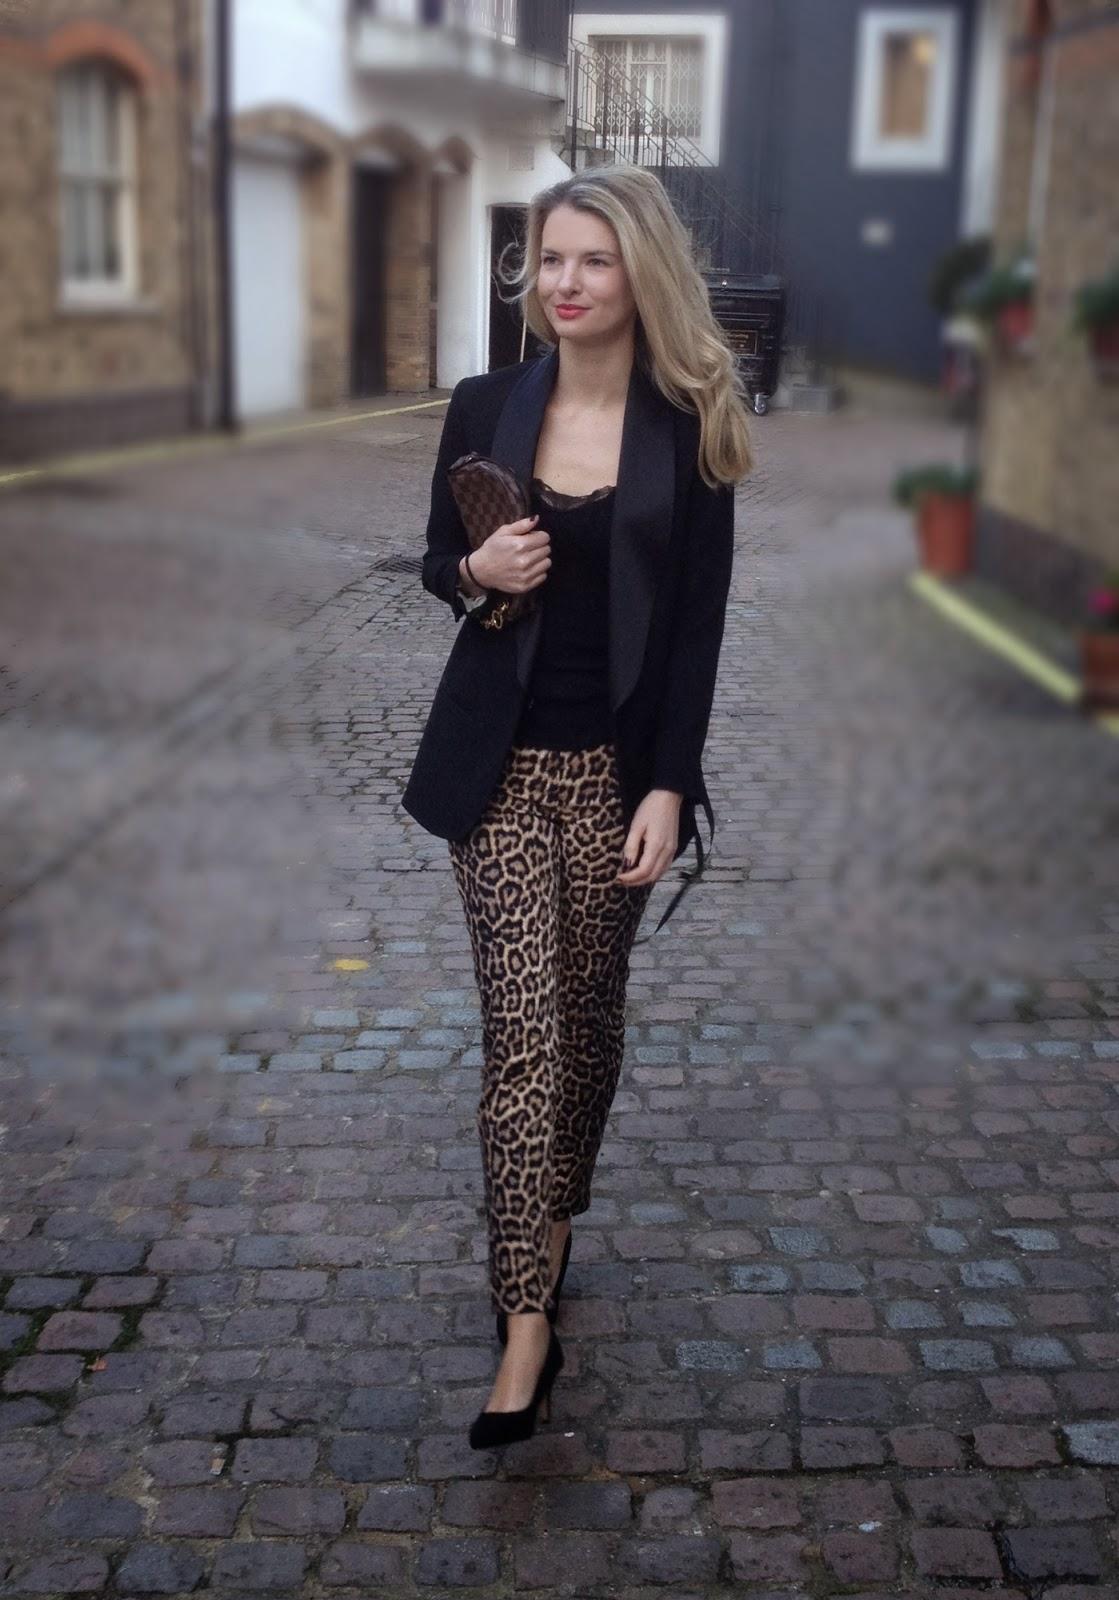 Isabel marant, isabel marant blazer, isabel marant pour h&m, isabel marant pour h&m blazer, isabel marant blazer, isabel maran tuxedo blazer, leopard print trousers, zara trousers, zara printed trousers